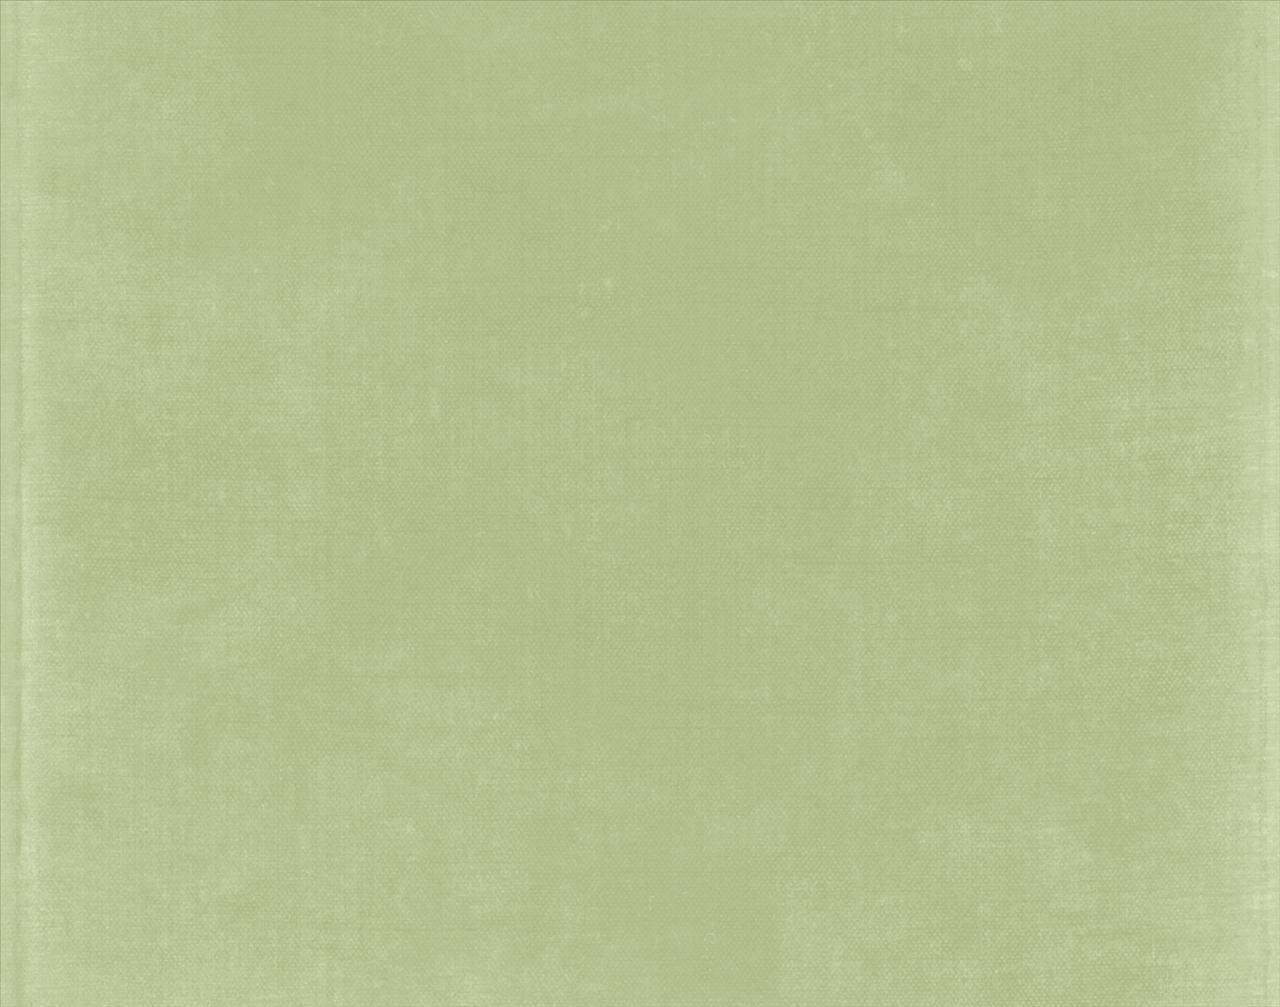 Sage Green Wallpaper Background Hd Wallpaper Background